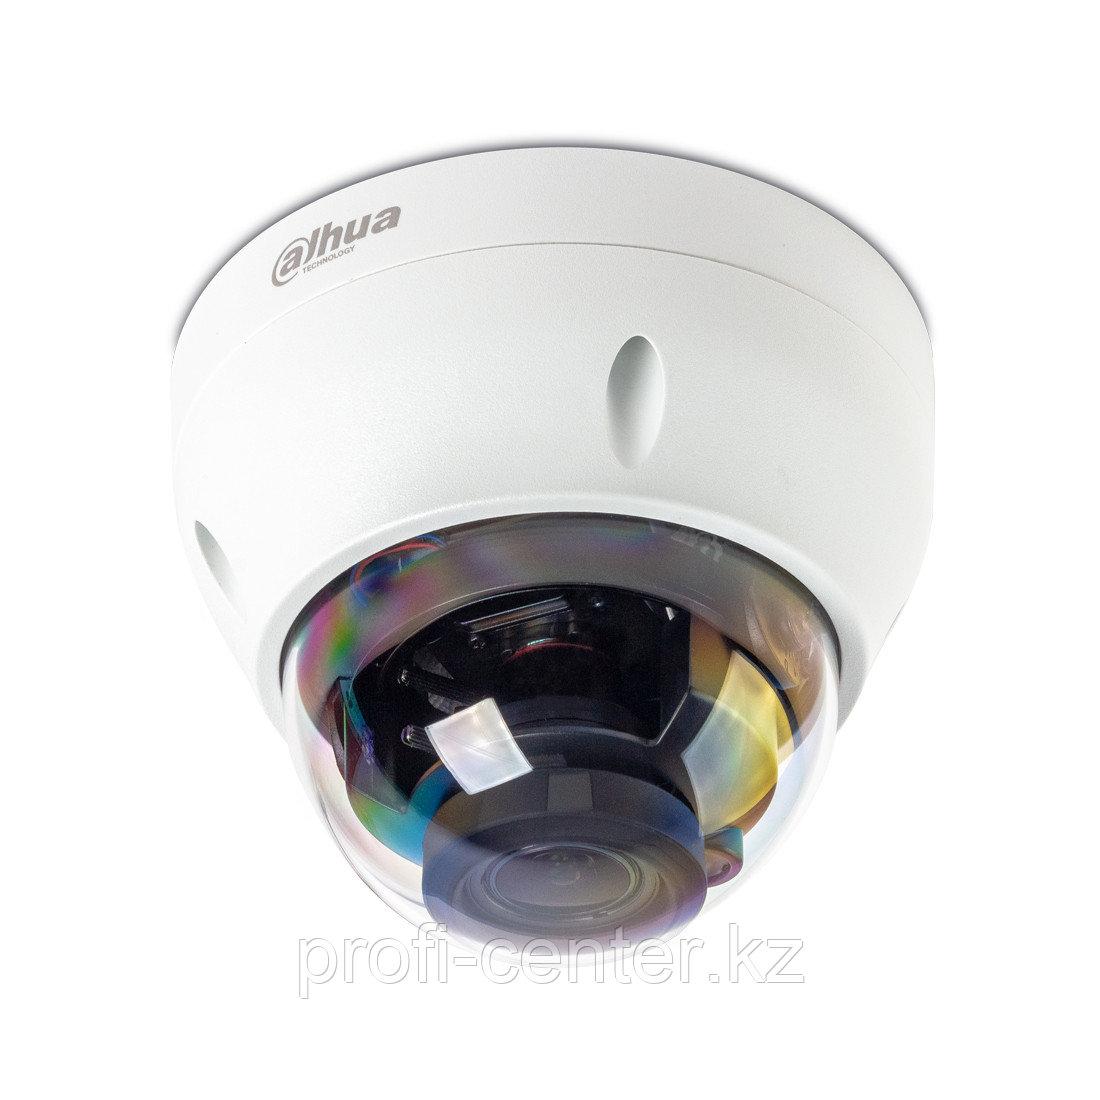 DH-HAC-HDPW1410RP-VF-2712 Купольная видеокамера Dahua